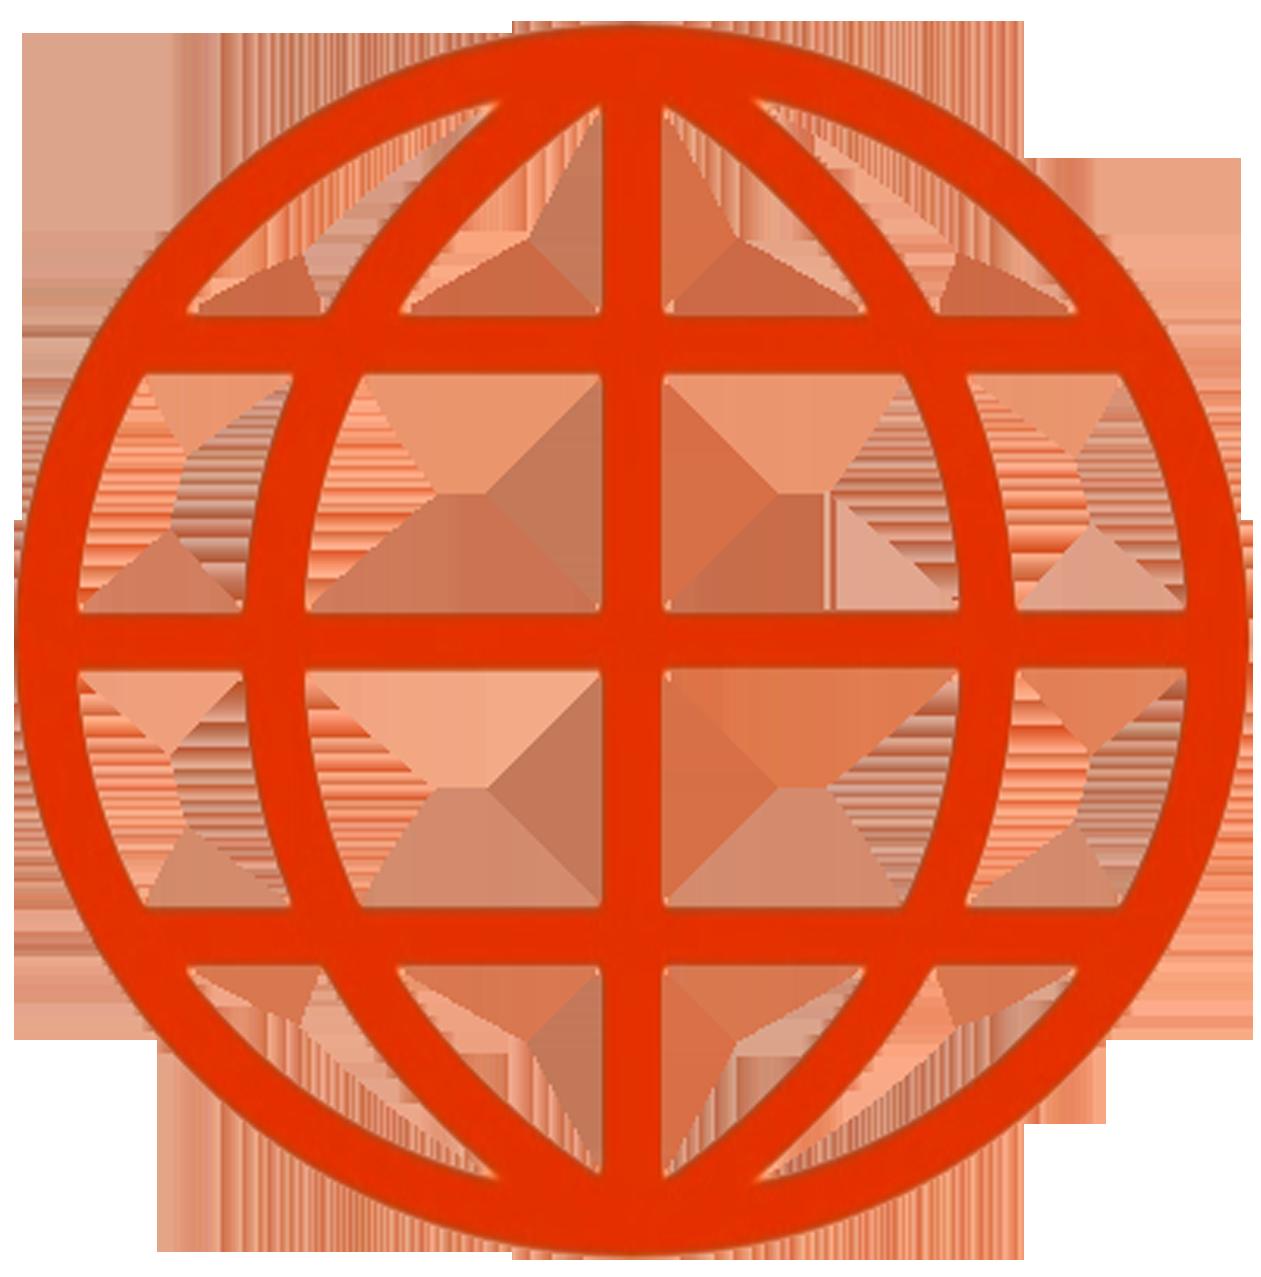 archivoam233rica televisi243n logo 2016png wikipedia la